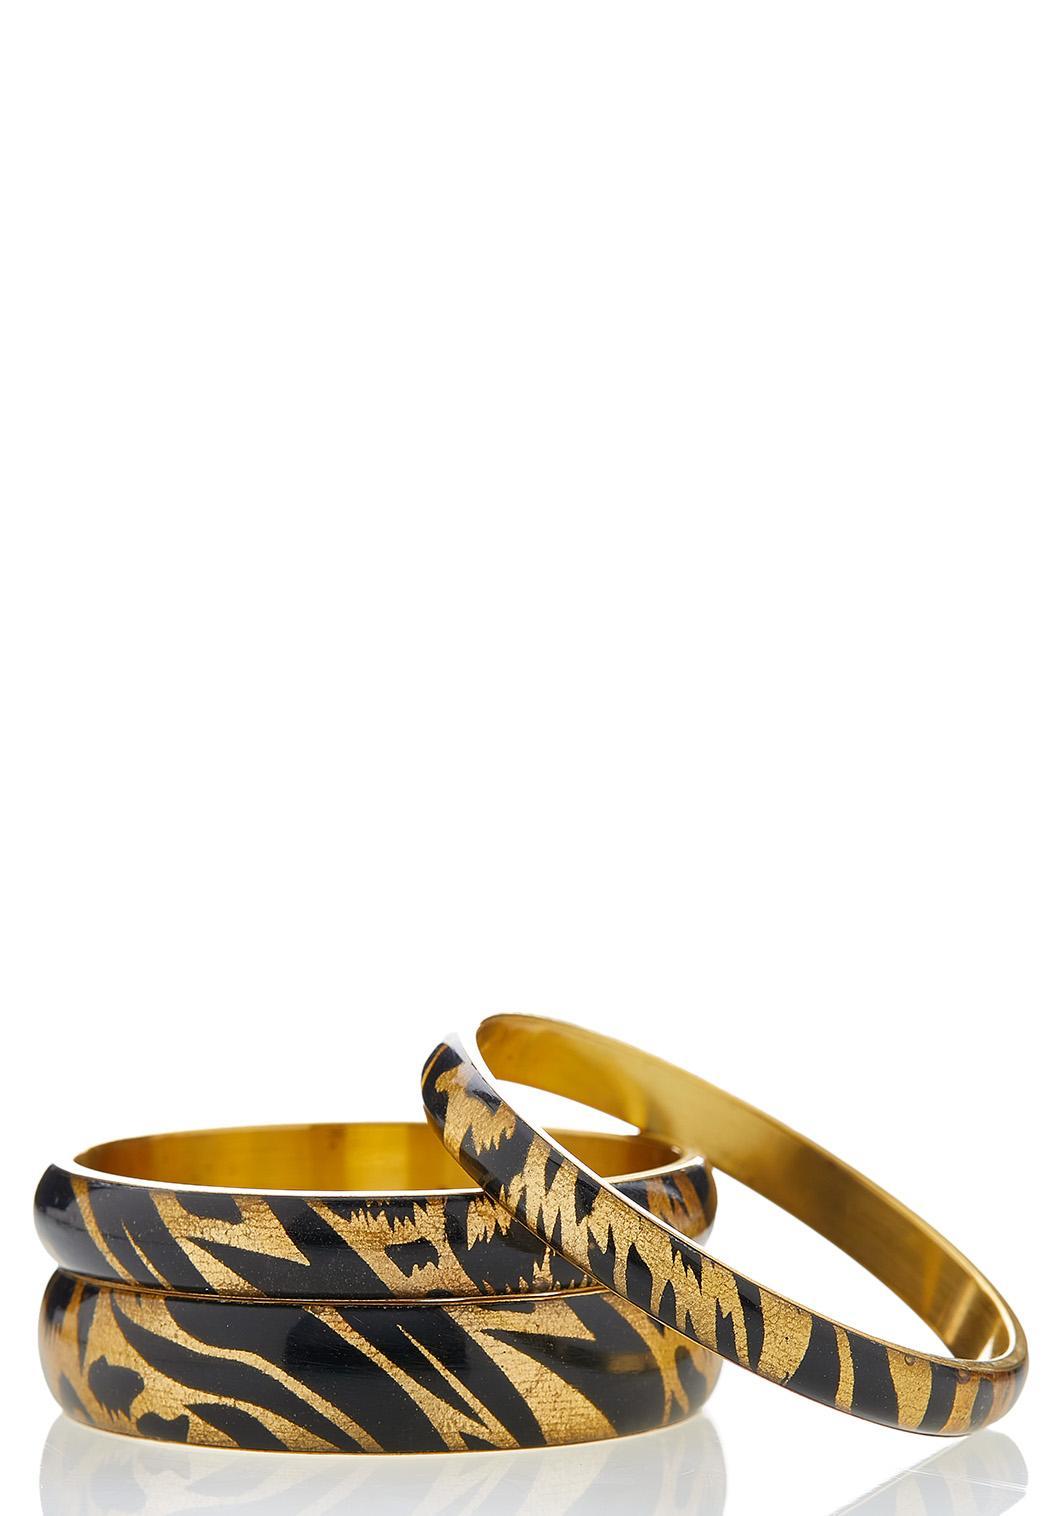 Leopard Bangle Bracelet Set